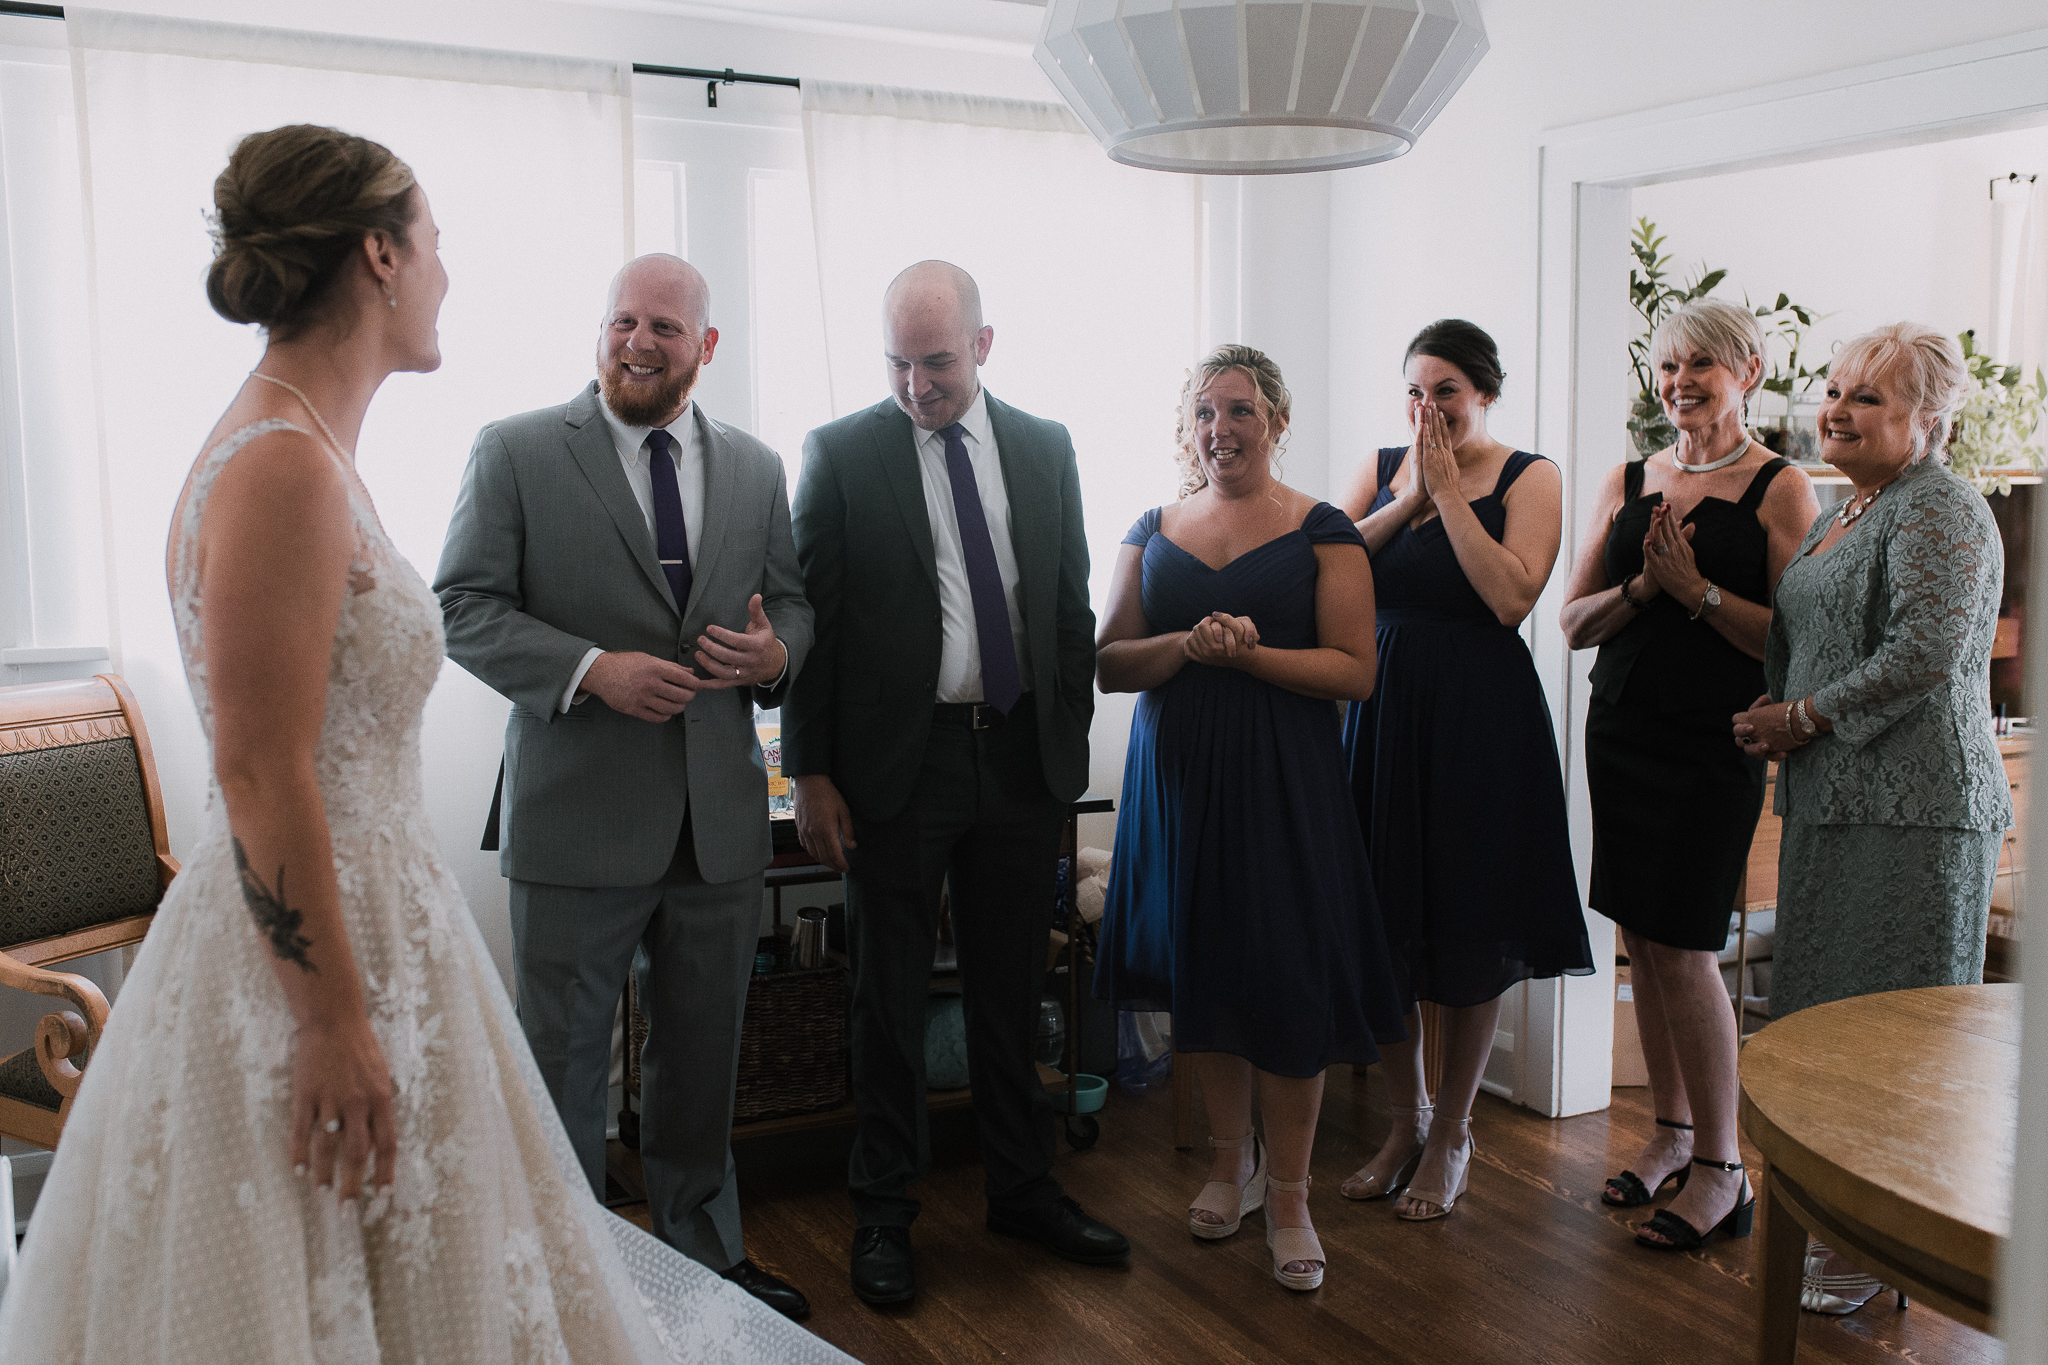 sheffwedding-65.JPG